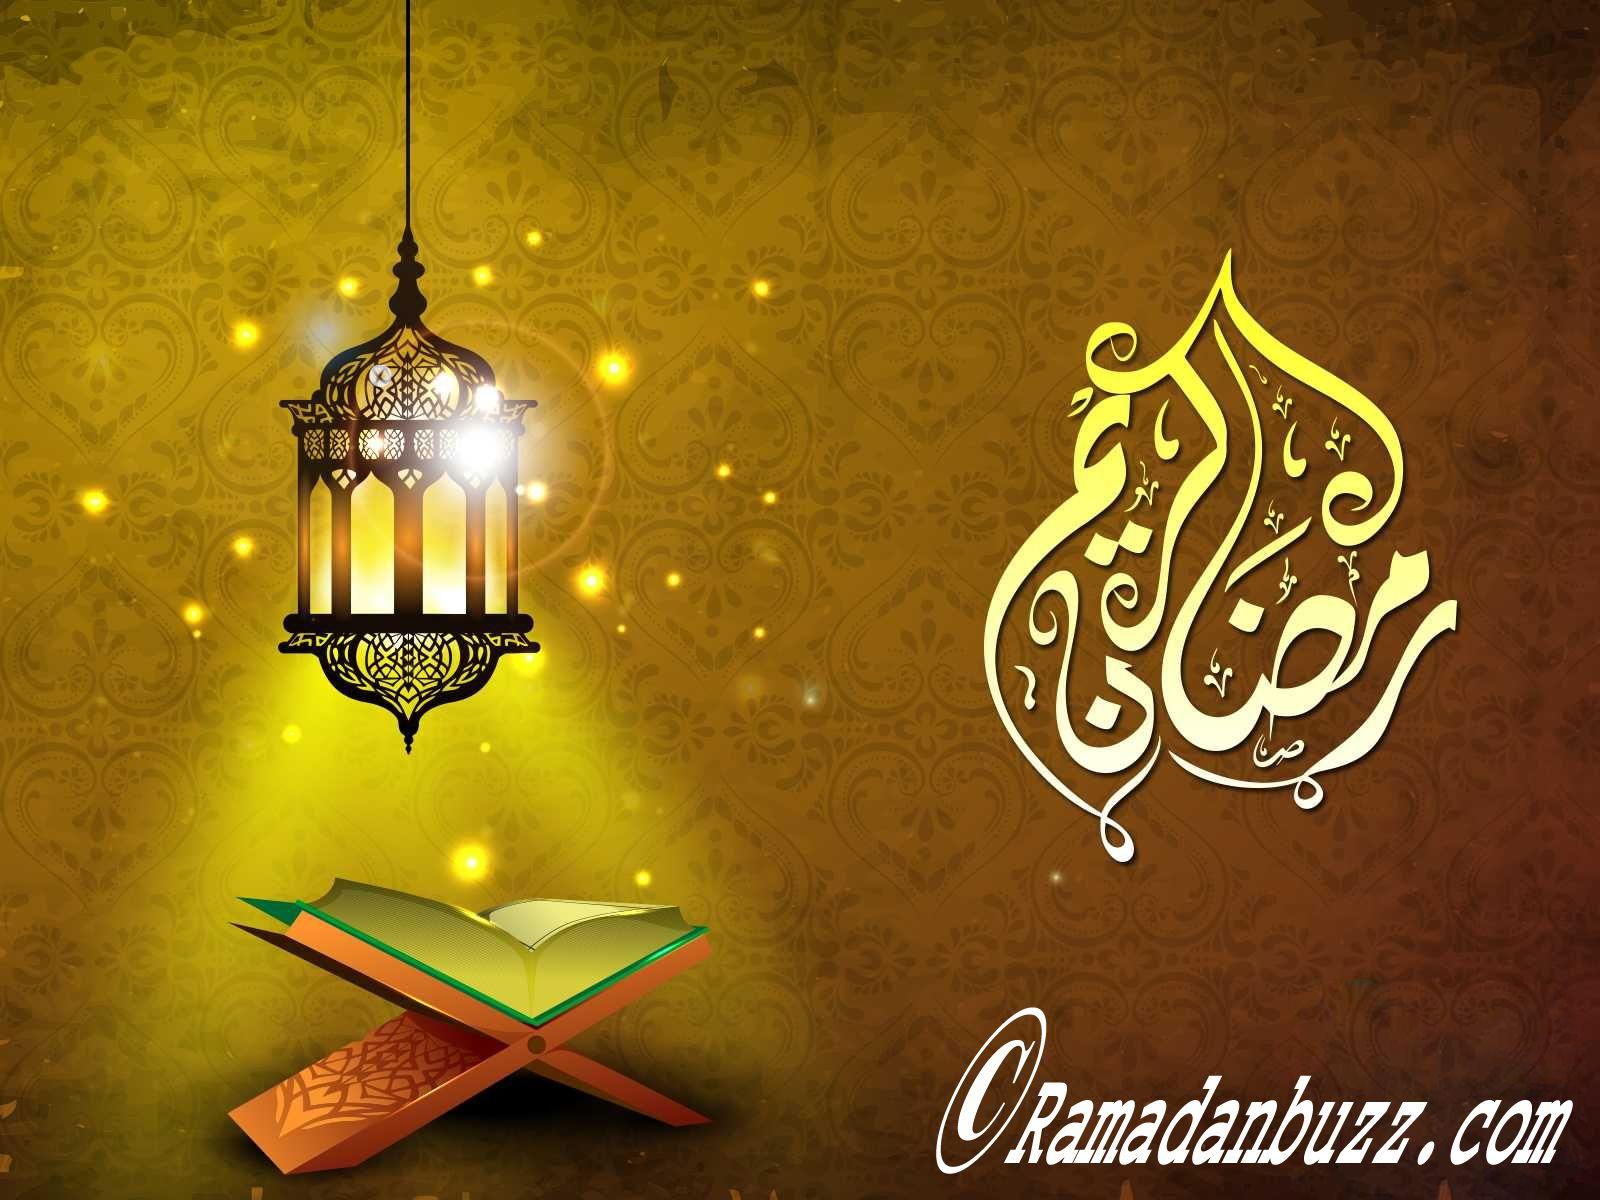 Ramadan Images Wallpapers Hd Ramzan Images Ramadan Ramadancoverphotos Ramadanwishes Ramadanwishesforfriend Ramadan Images Ramzan Images Ramadan Wallpaper Hd